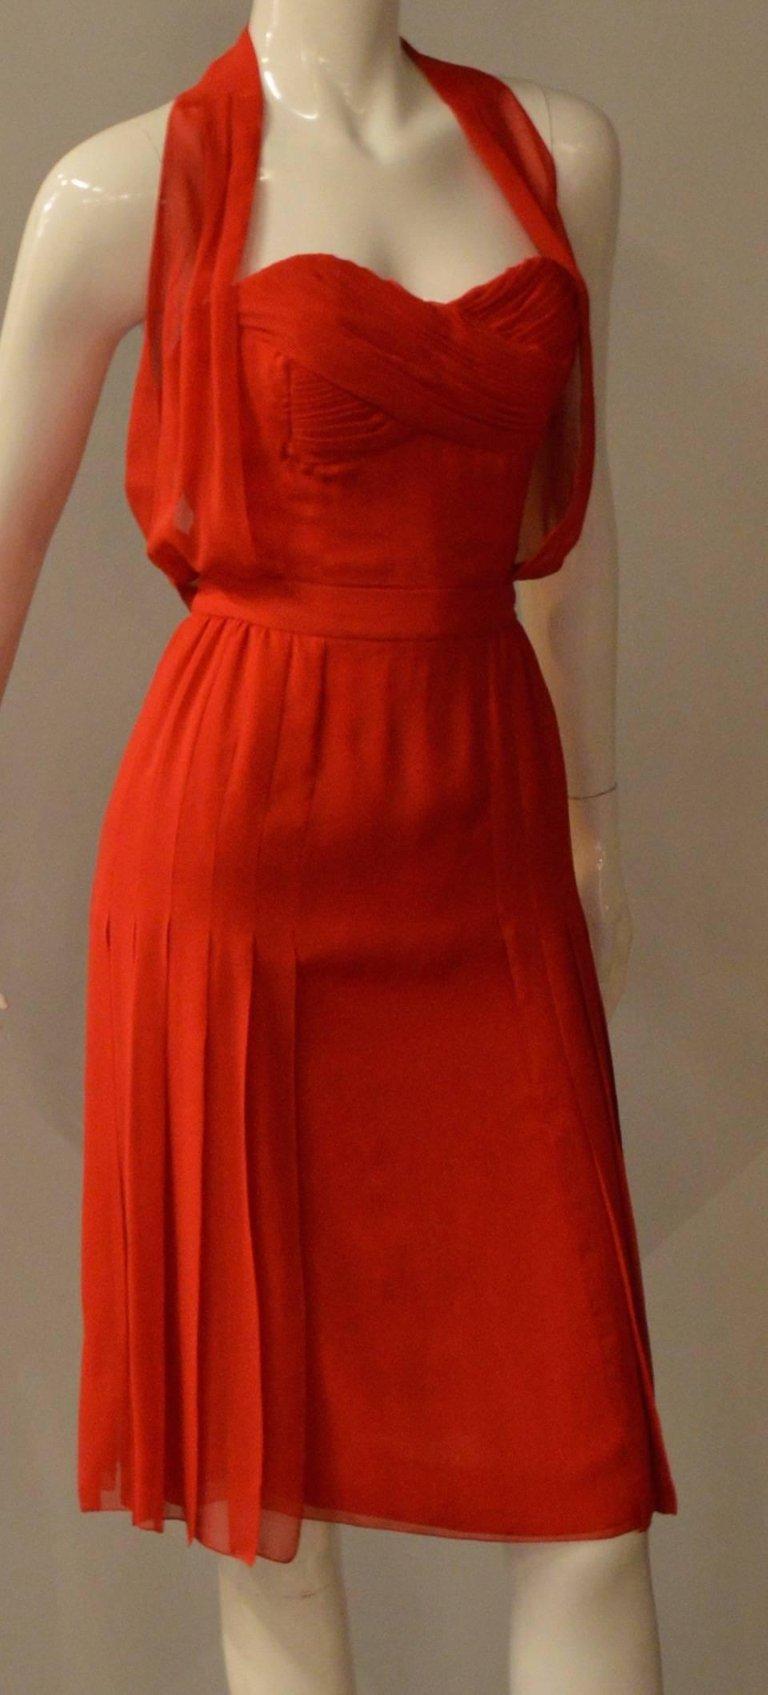 chanel evening dresses photo - 1